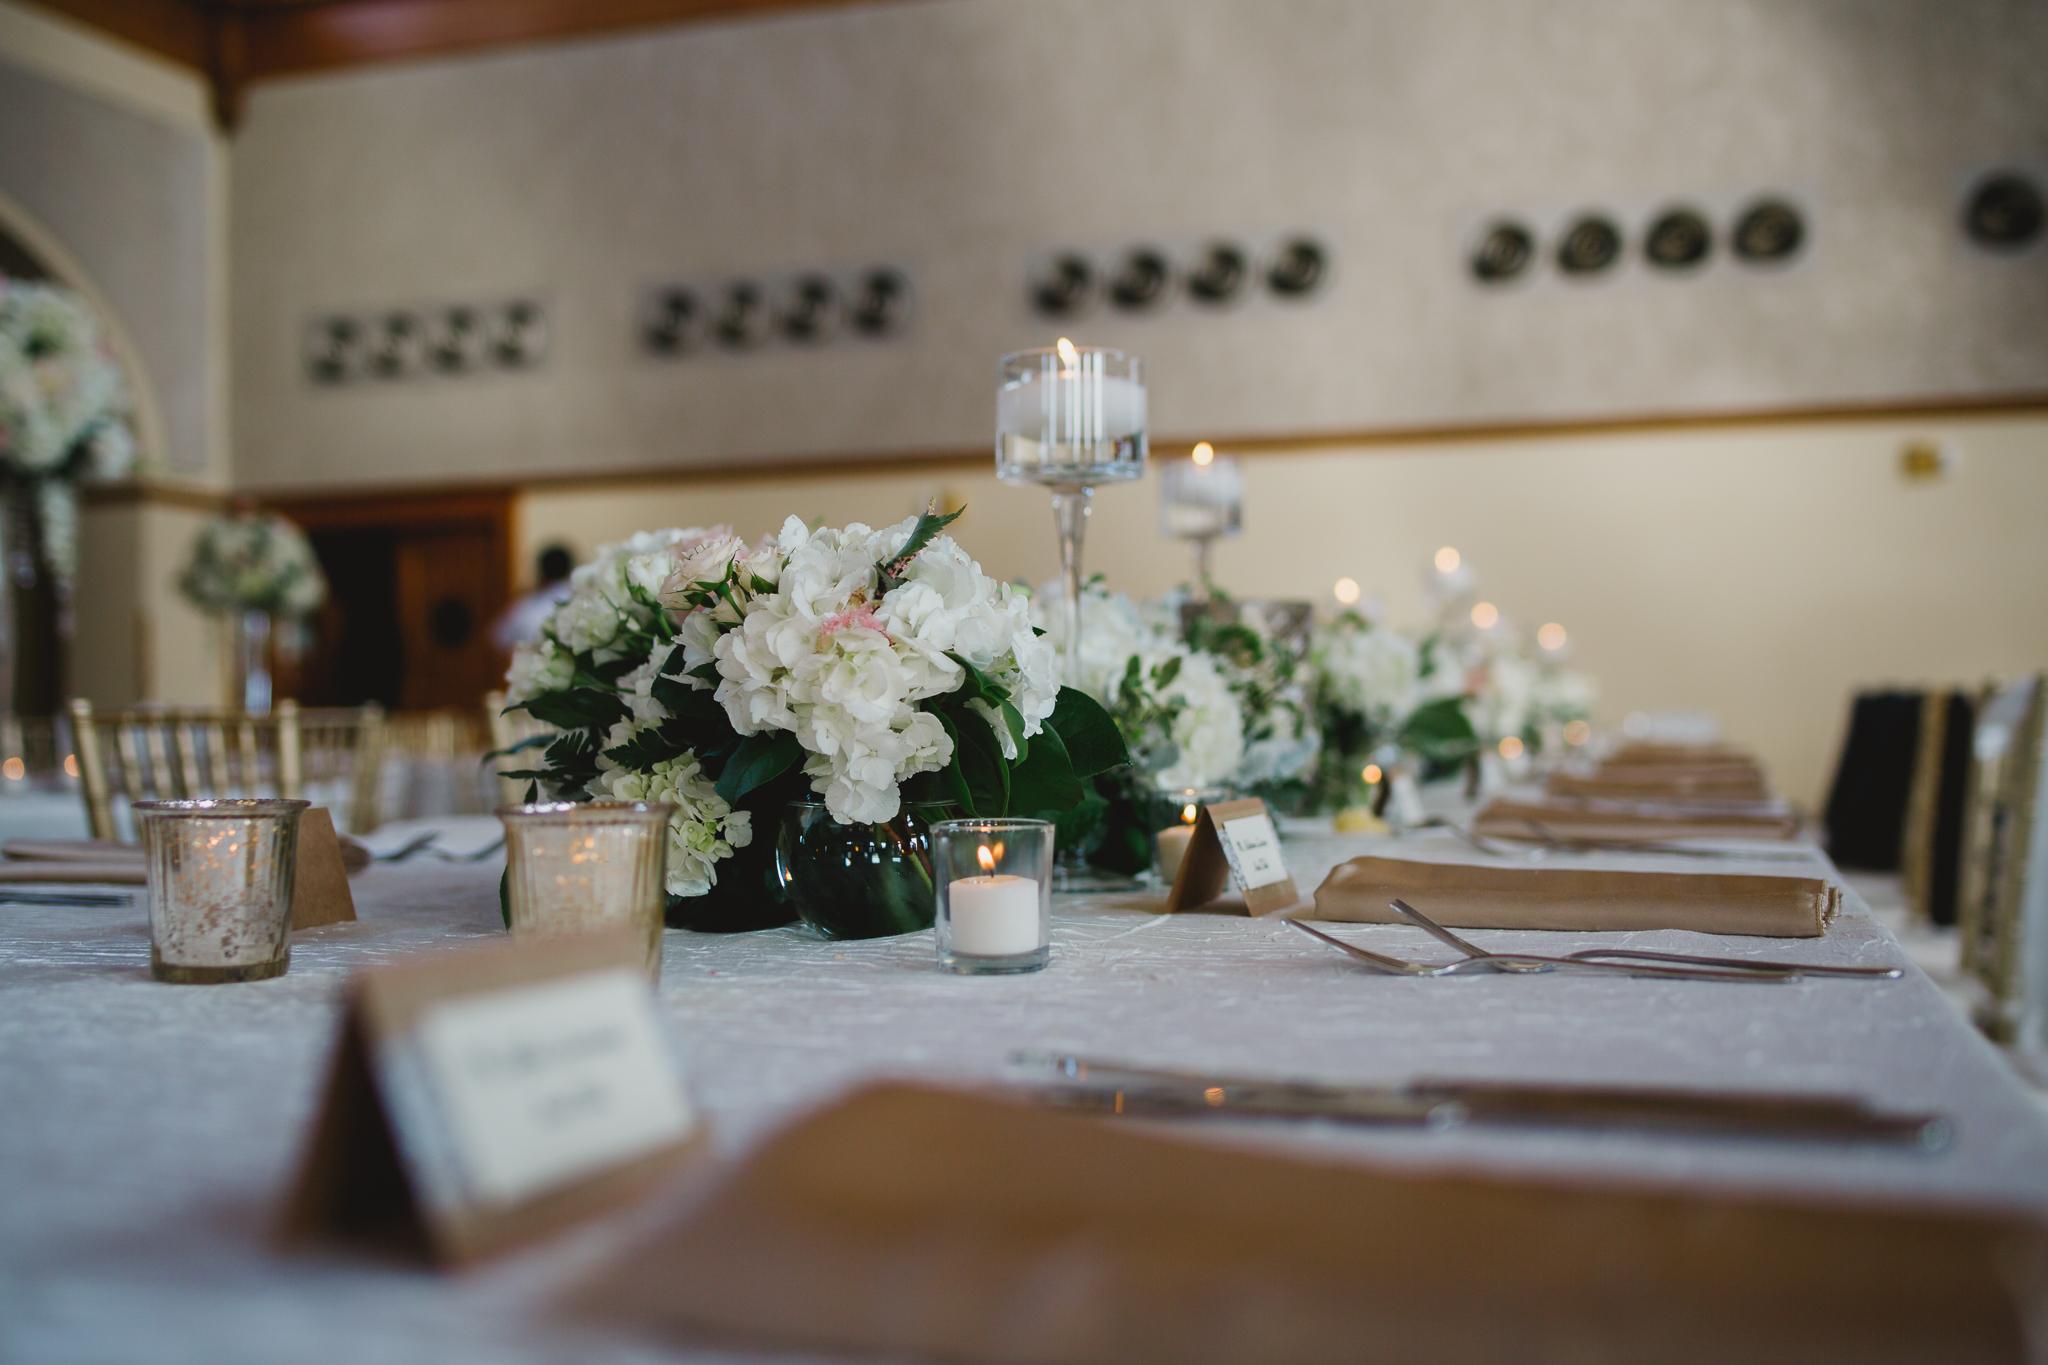 Michael and Kelly - the ashton depot - wedding DFW - wedding photographer- elizalde photography (82 of 150).jpg